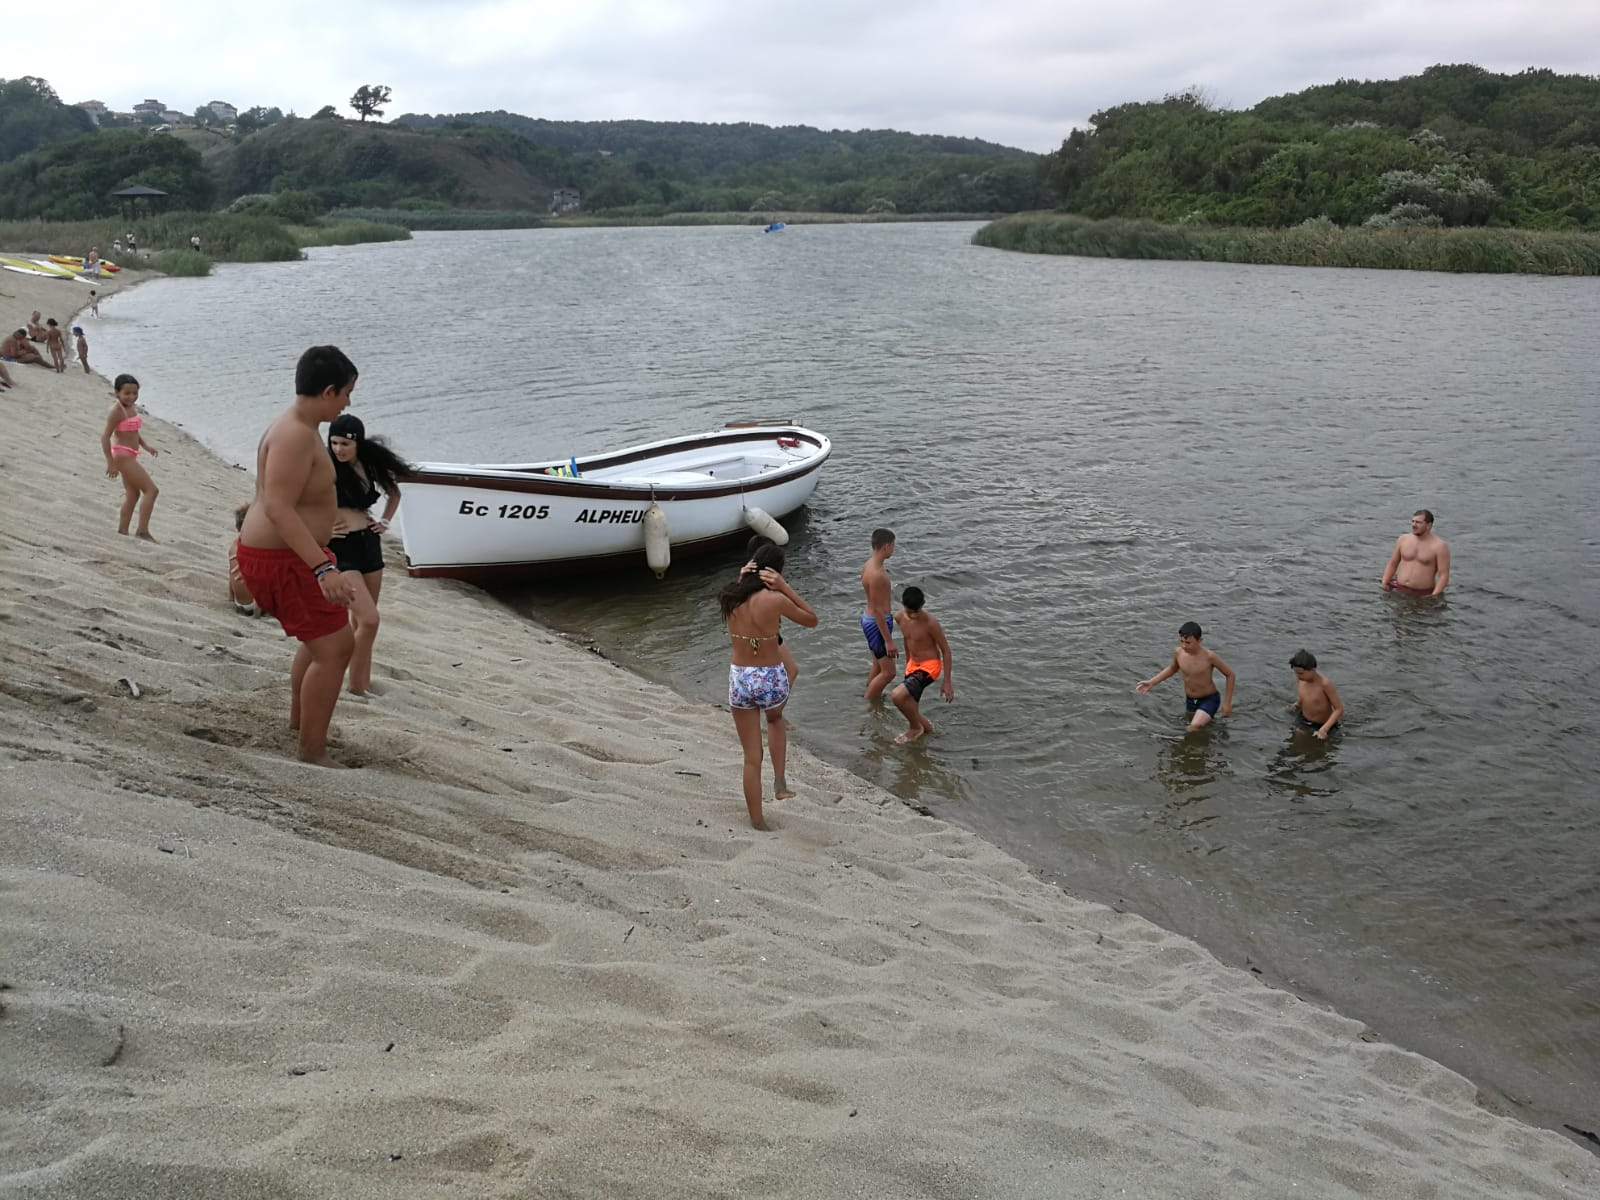 Z camp, Day 17 - Veleka river trip - boys in the waters of Veleka